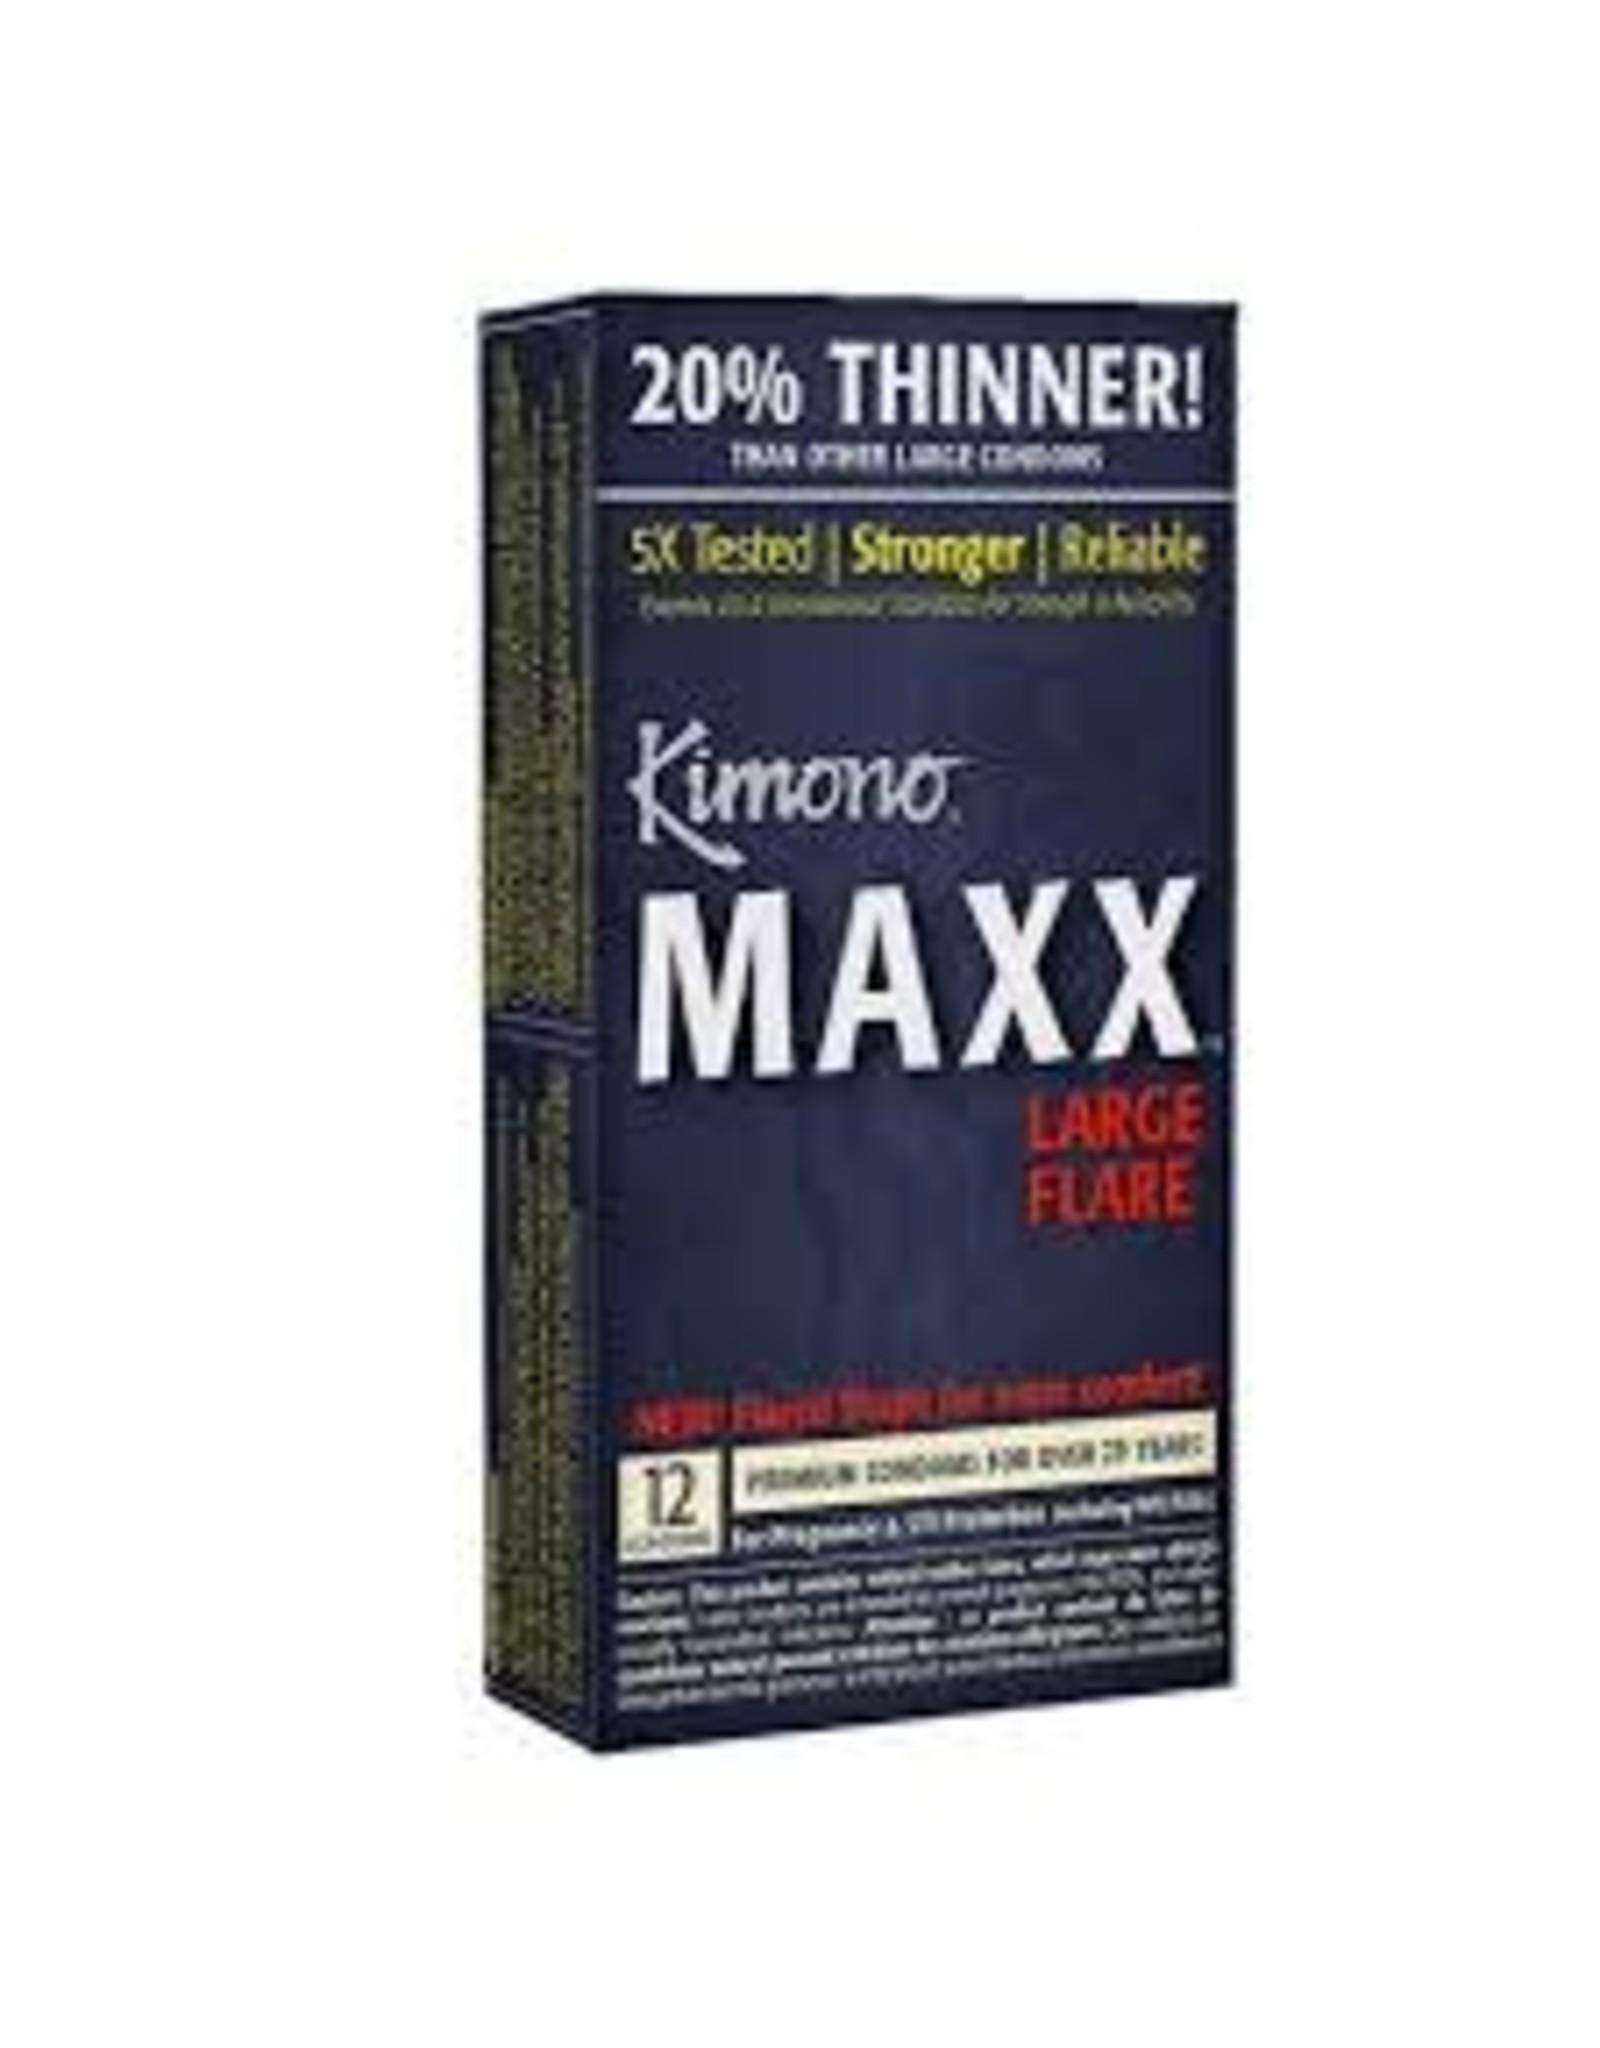 KIMONO MAXX LARGE FLARE x12